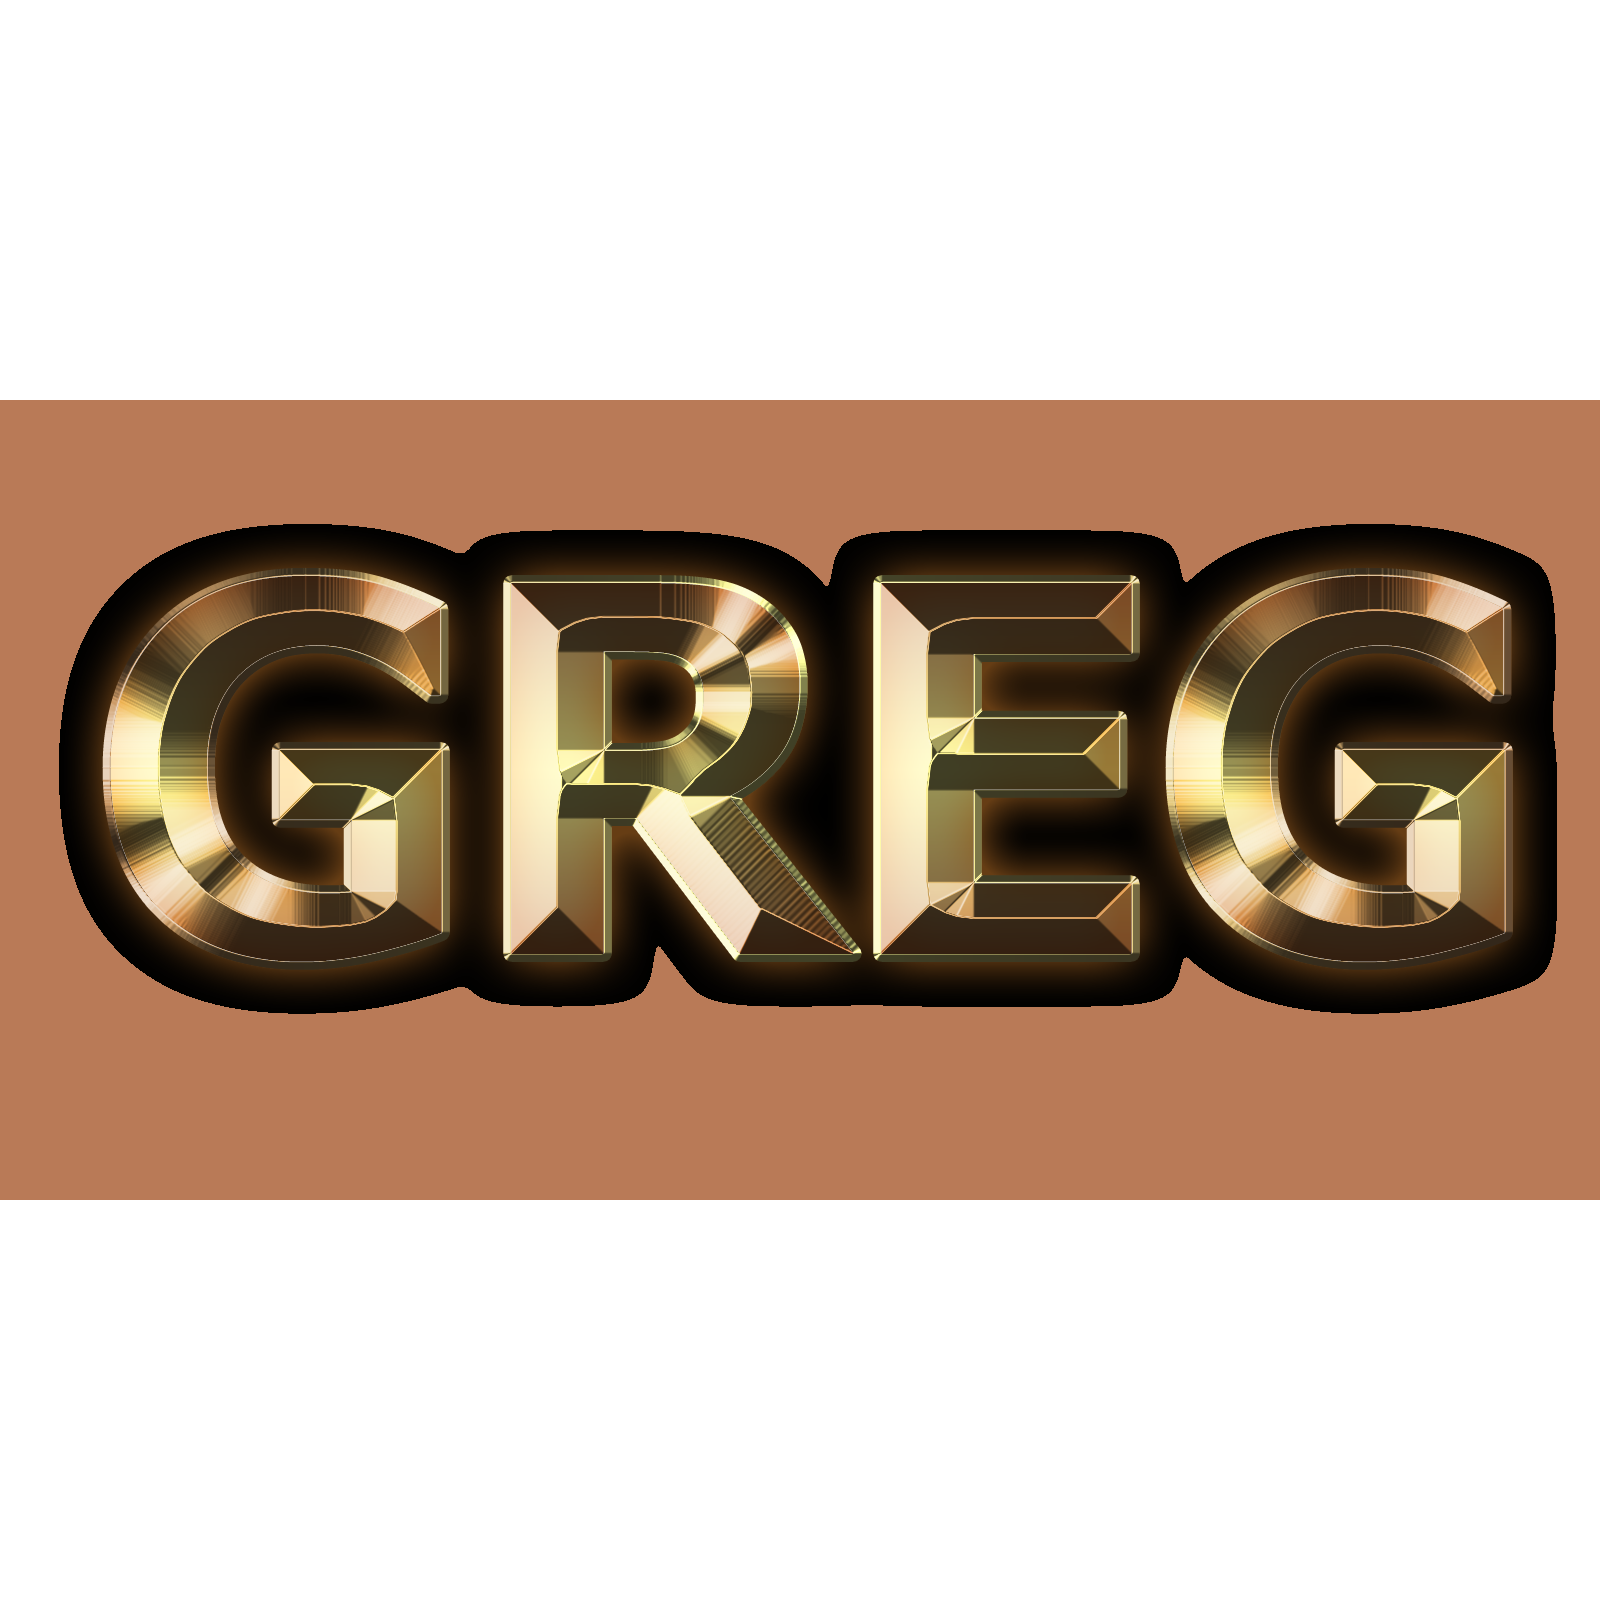 PANKLIY GREG INC - San Diego, CA 92101 - (619)229-9430 | ShowMeLocal.com